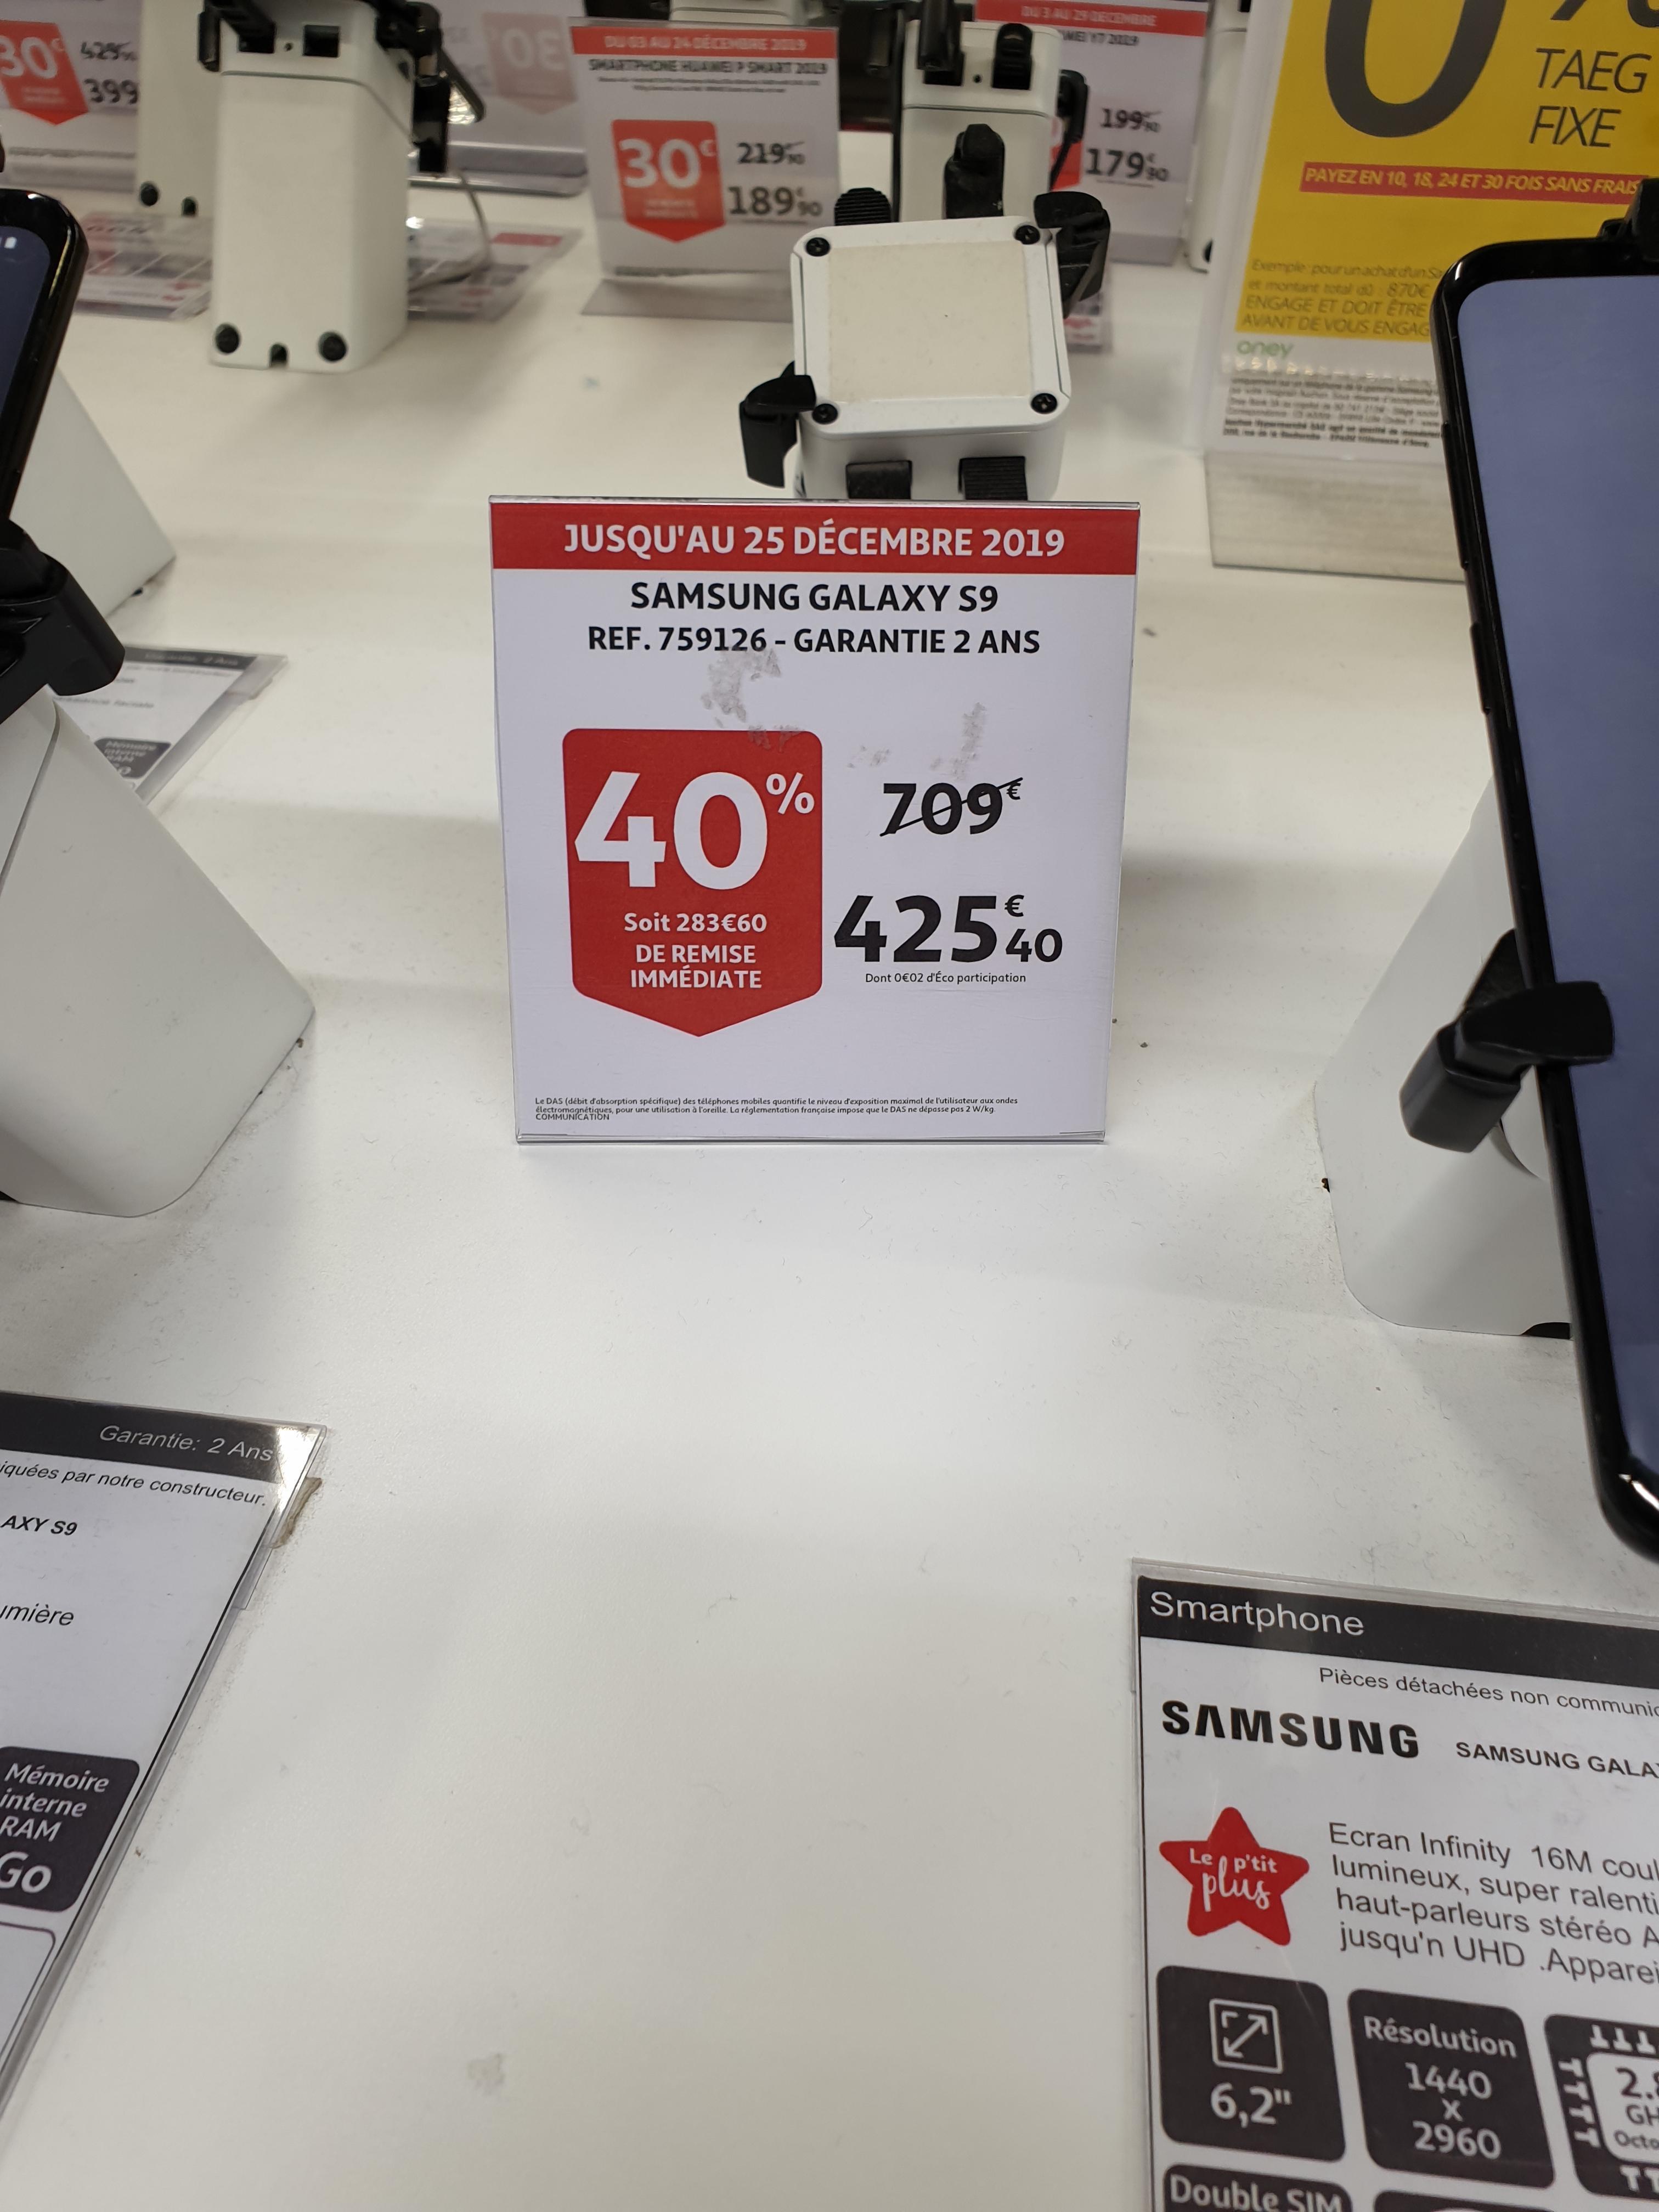 "Smartphone 5.8"" Samsung Galaxy S9 - Auchan La défense (92)"